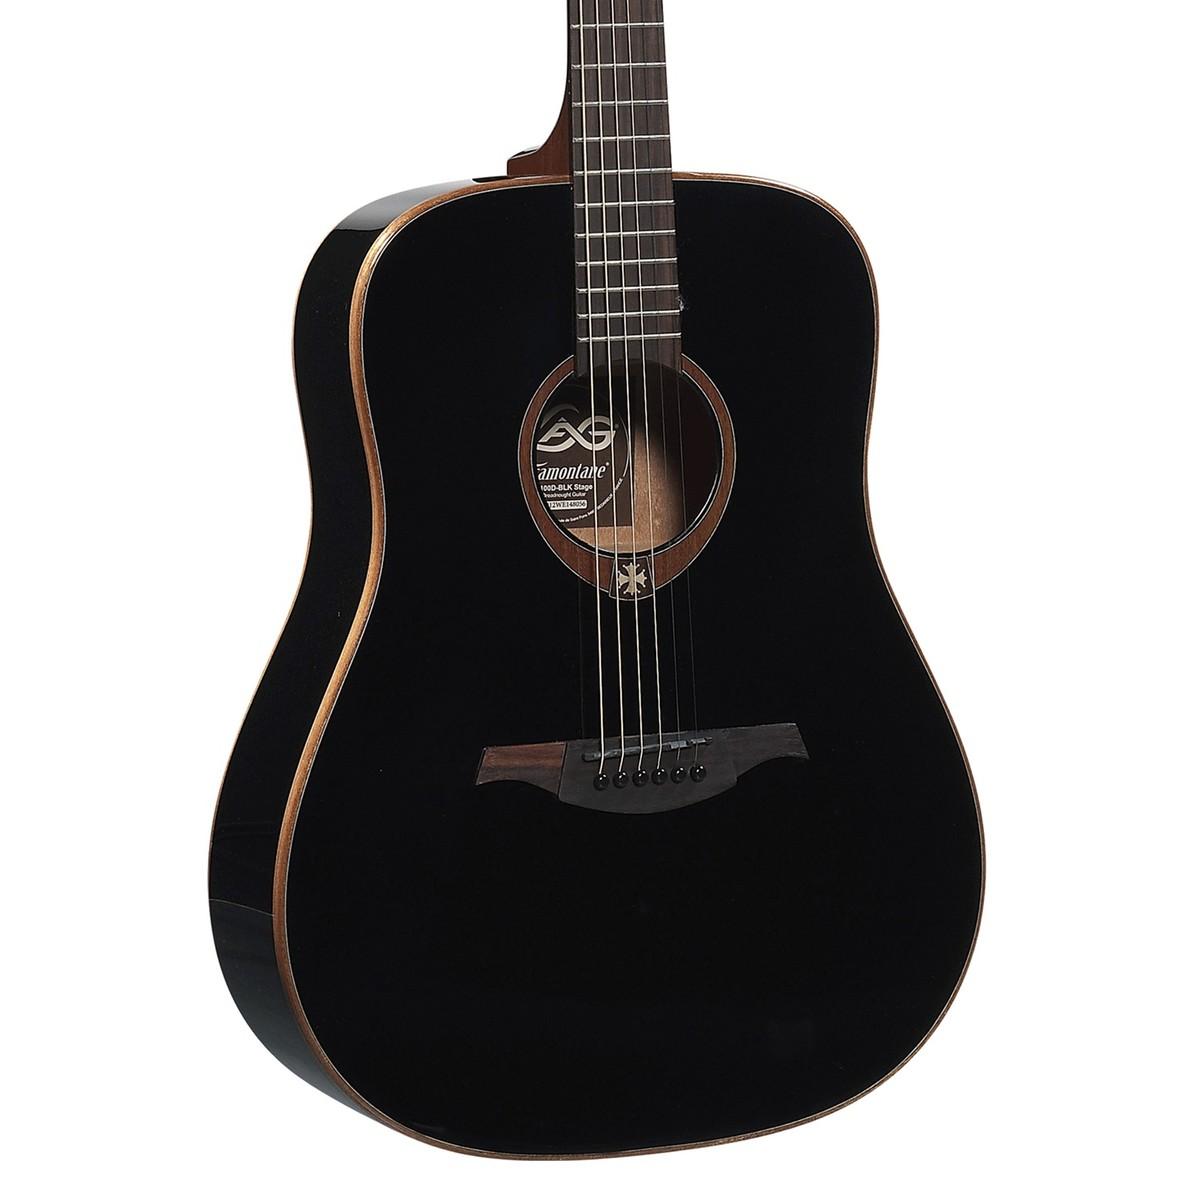 lag t100d dreadnought acoustic guitar black at. Black Bedroom Furniture Sets. Home Design Ideas